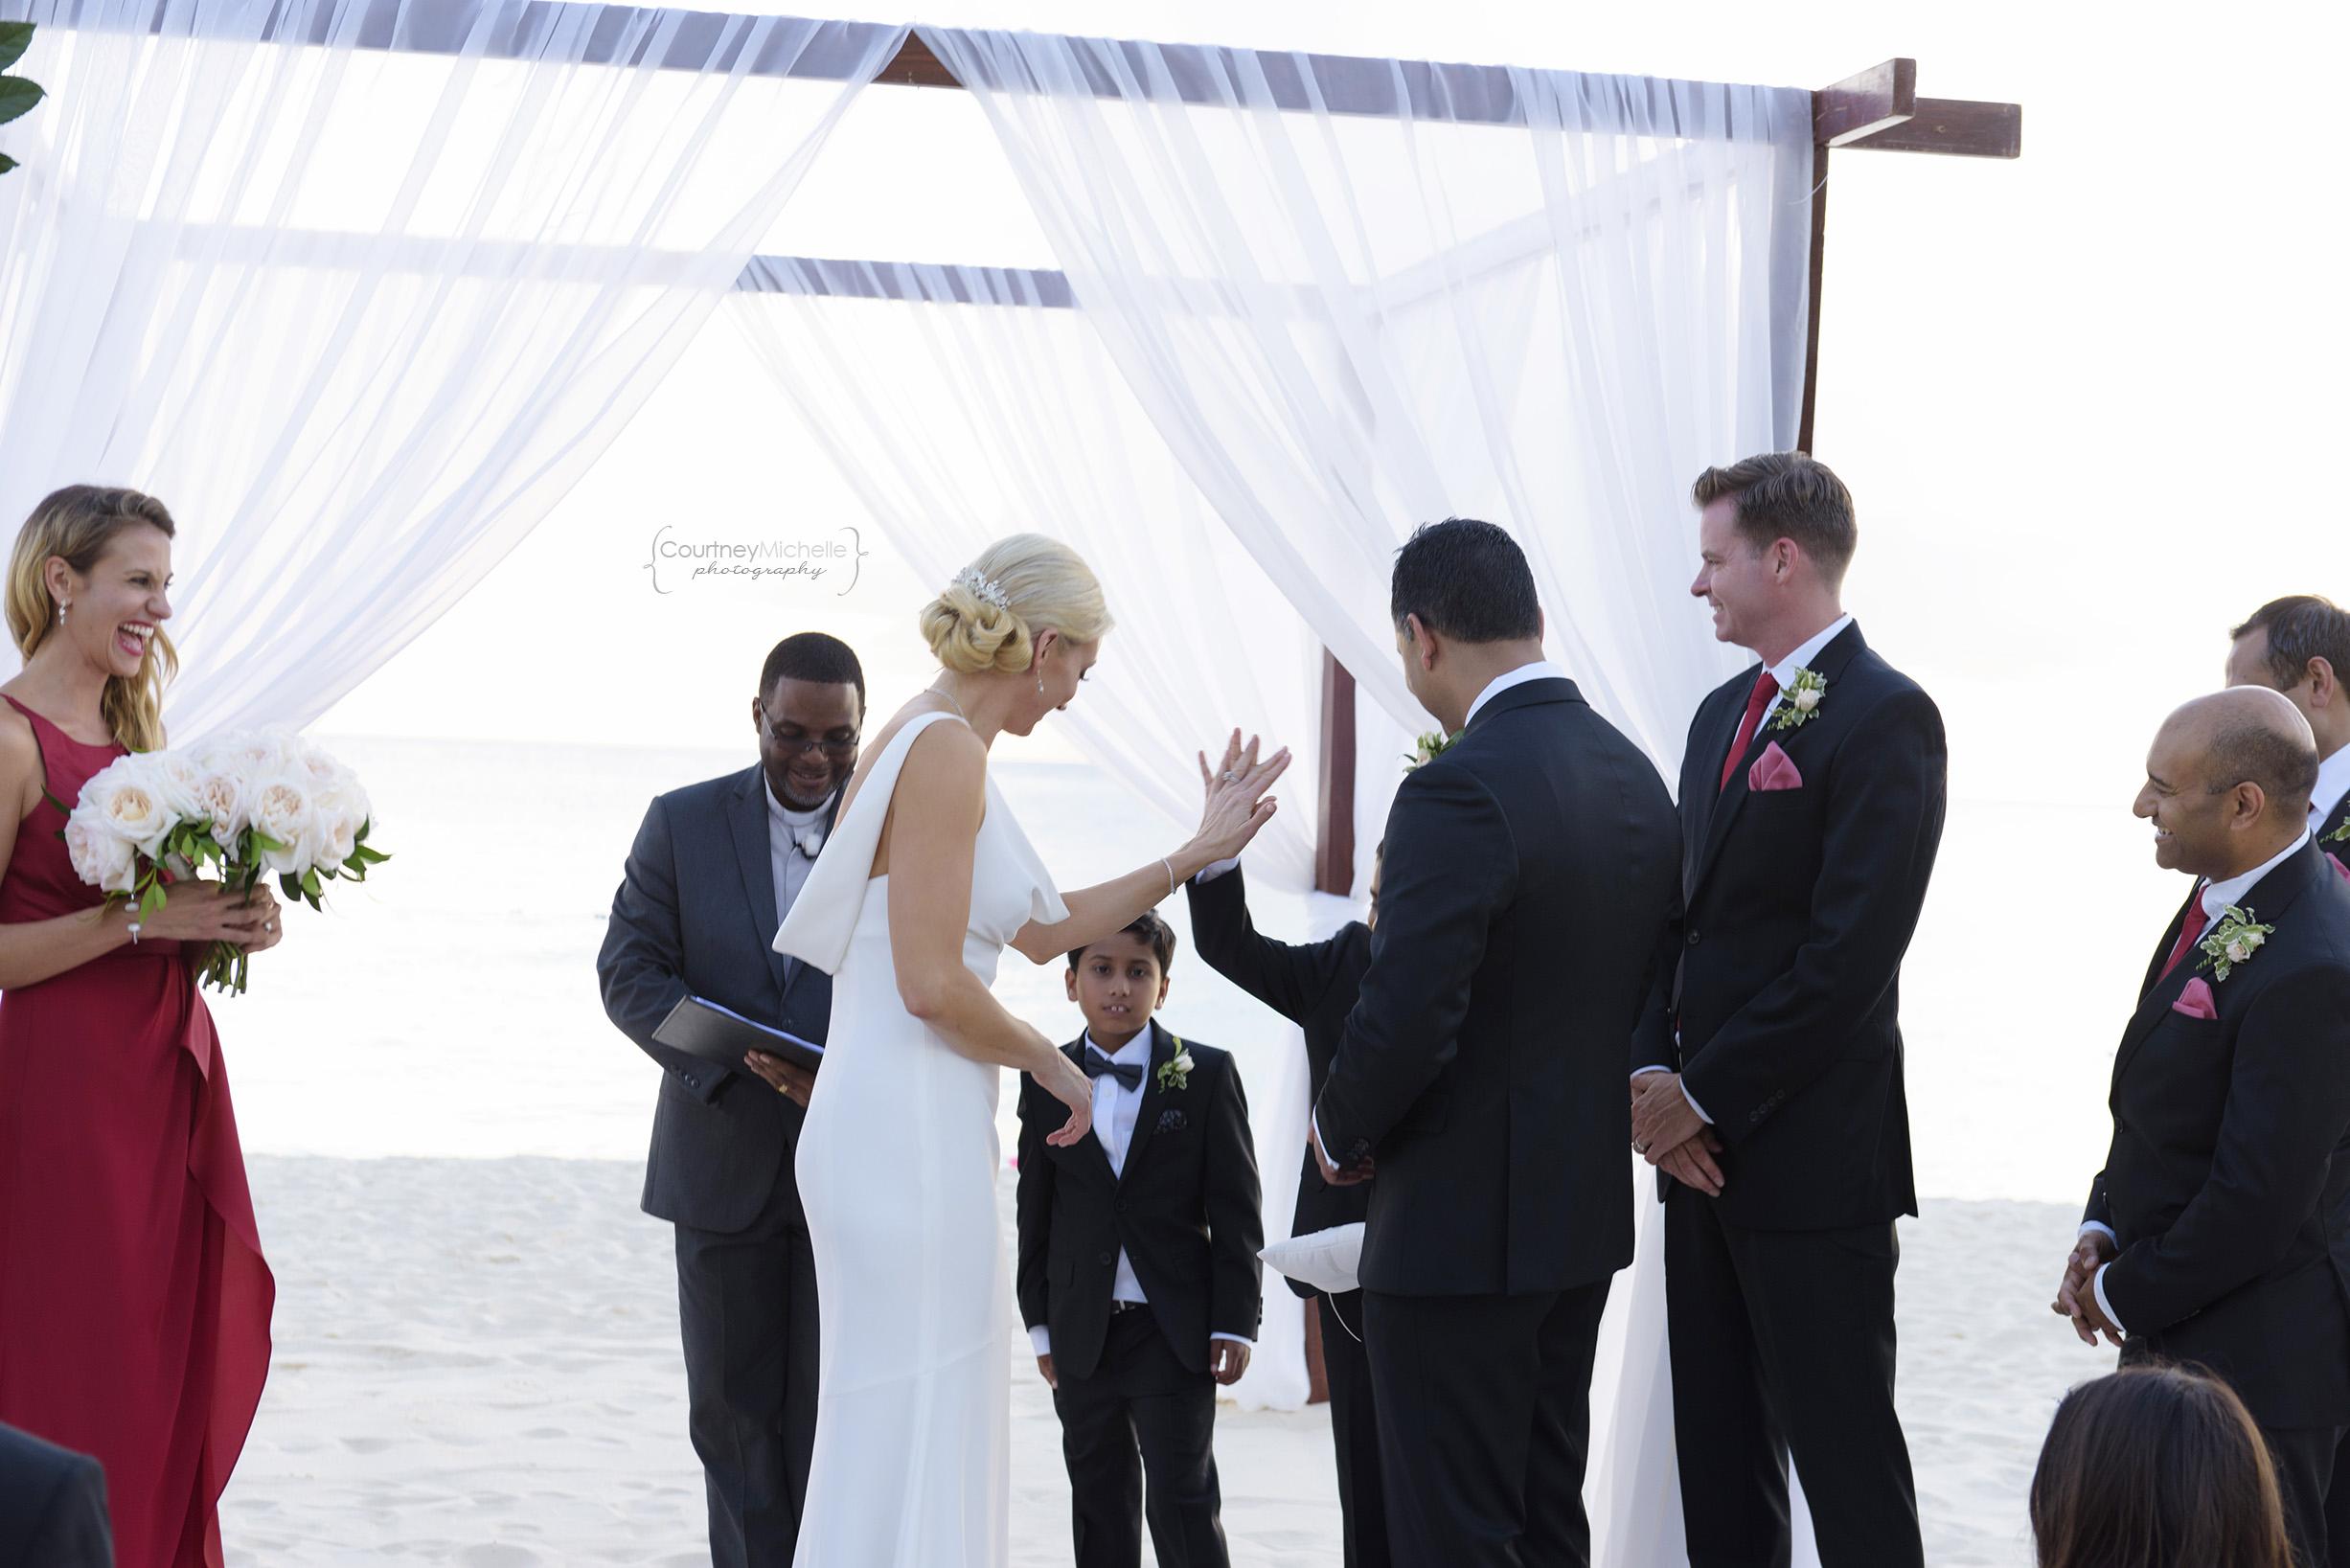 grand-cayman-beach-wedding-photography-by-courtney-laper©CopyrightCMP-LeaAnneRaj-7754.jpg